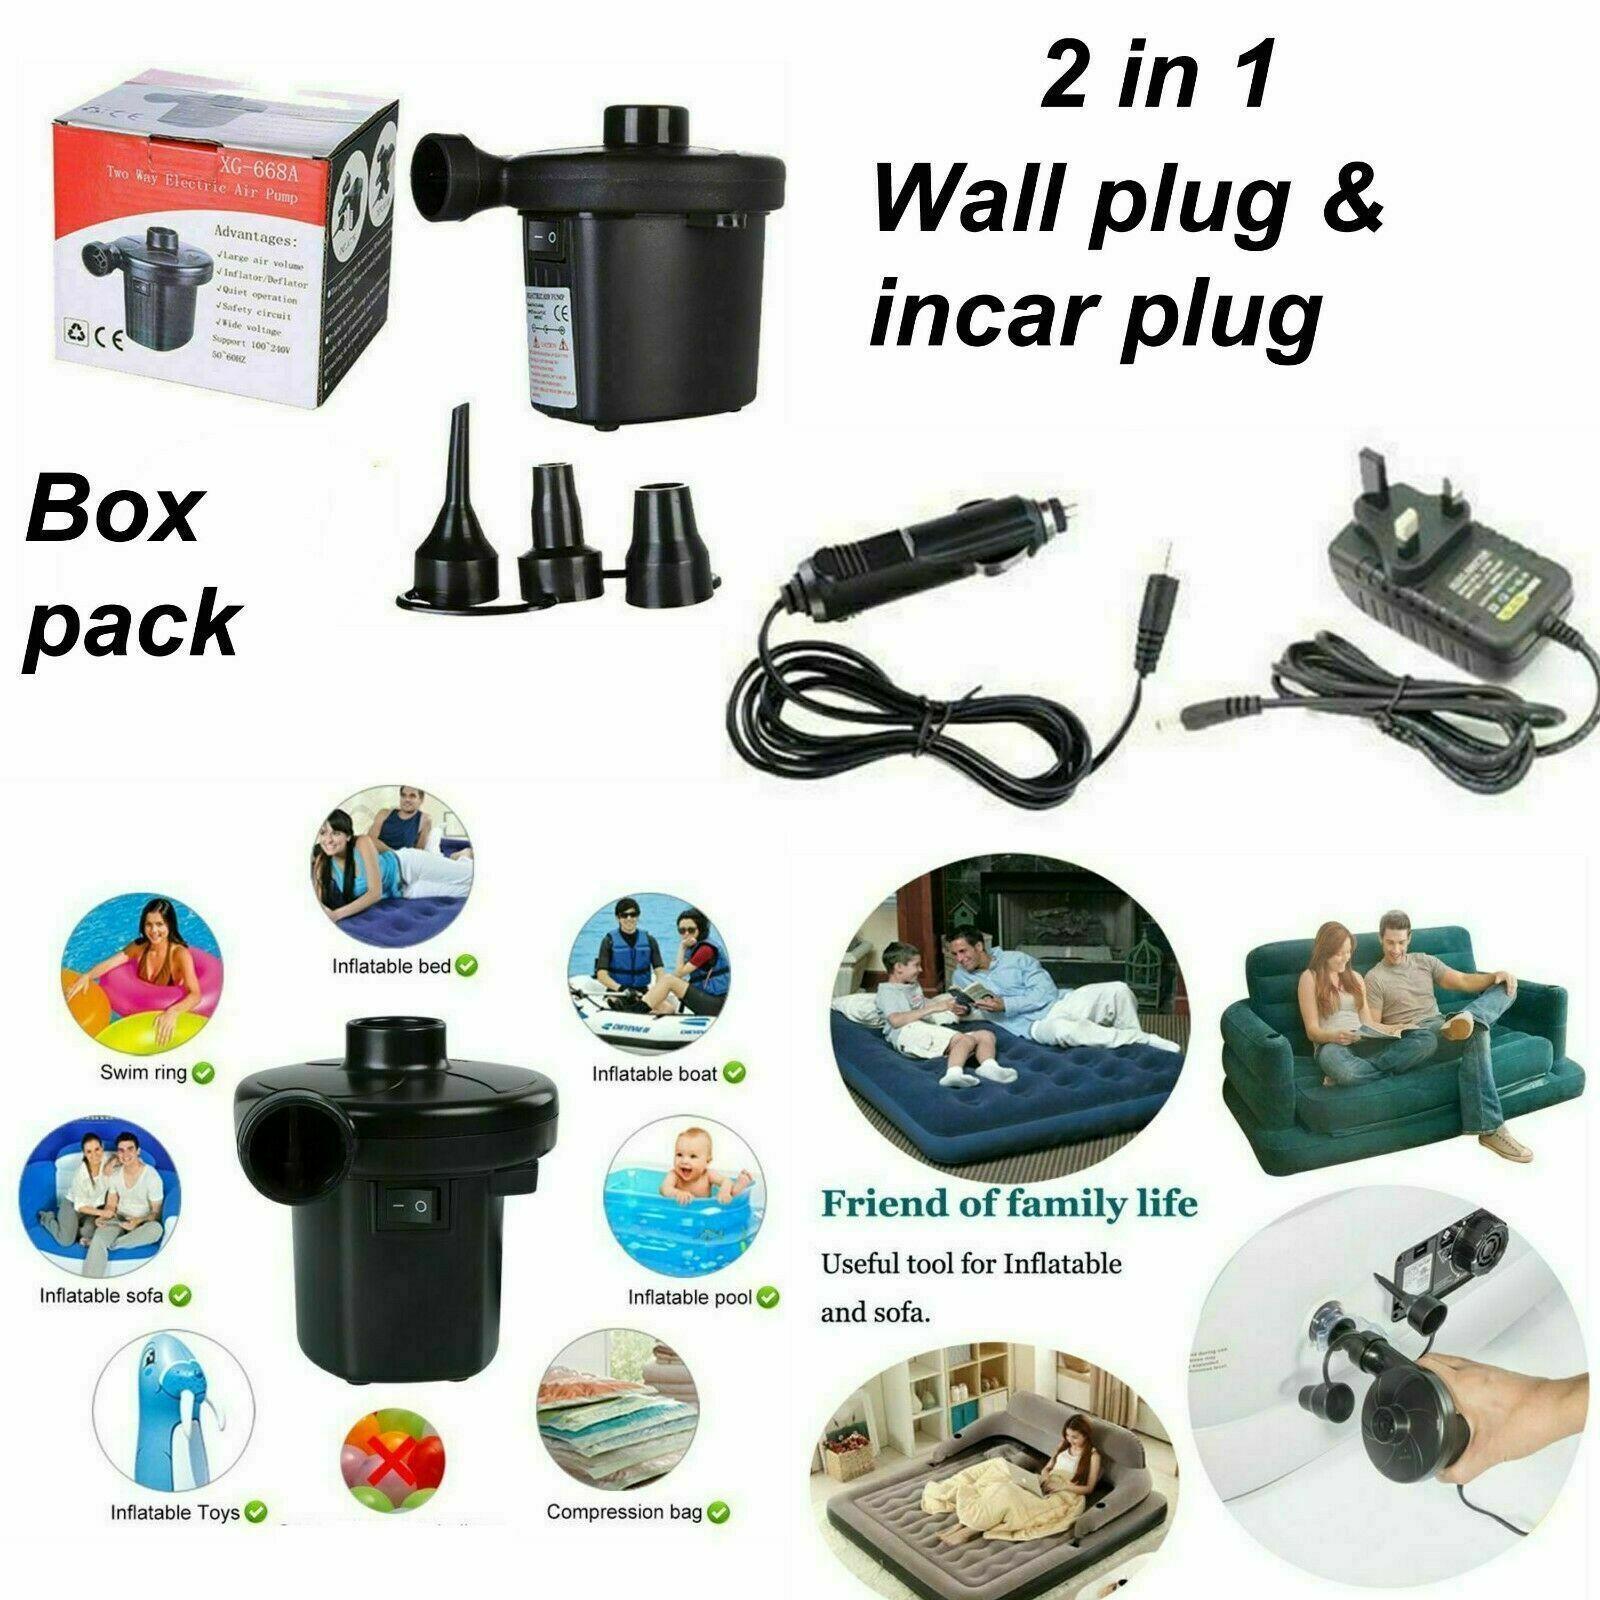 ELECTRIC 3 VALVE ADAPTOR AIR PUMP INFLATING BOAT BED PADDLING POOL CAMPING PU104